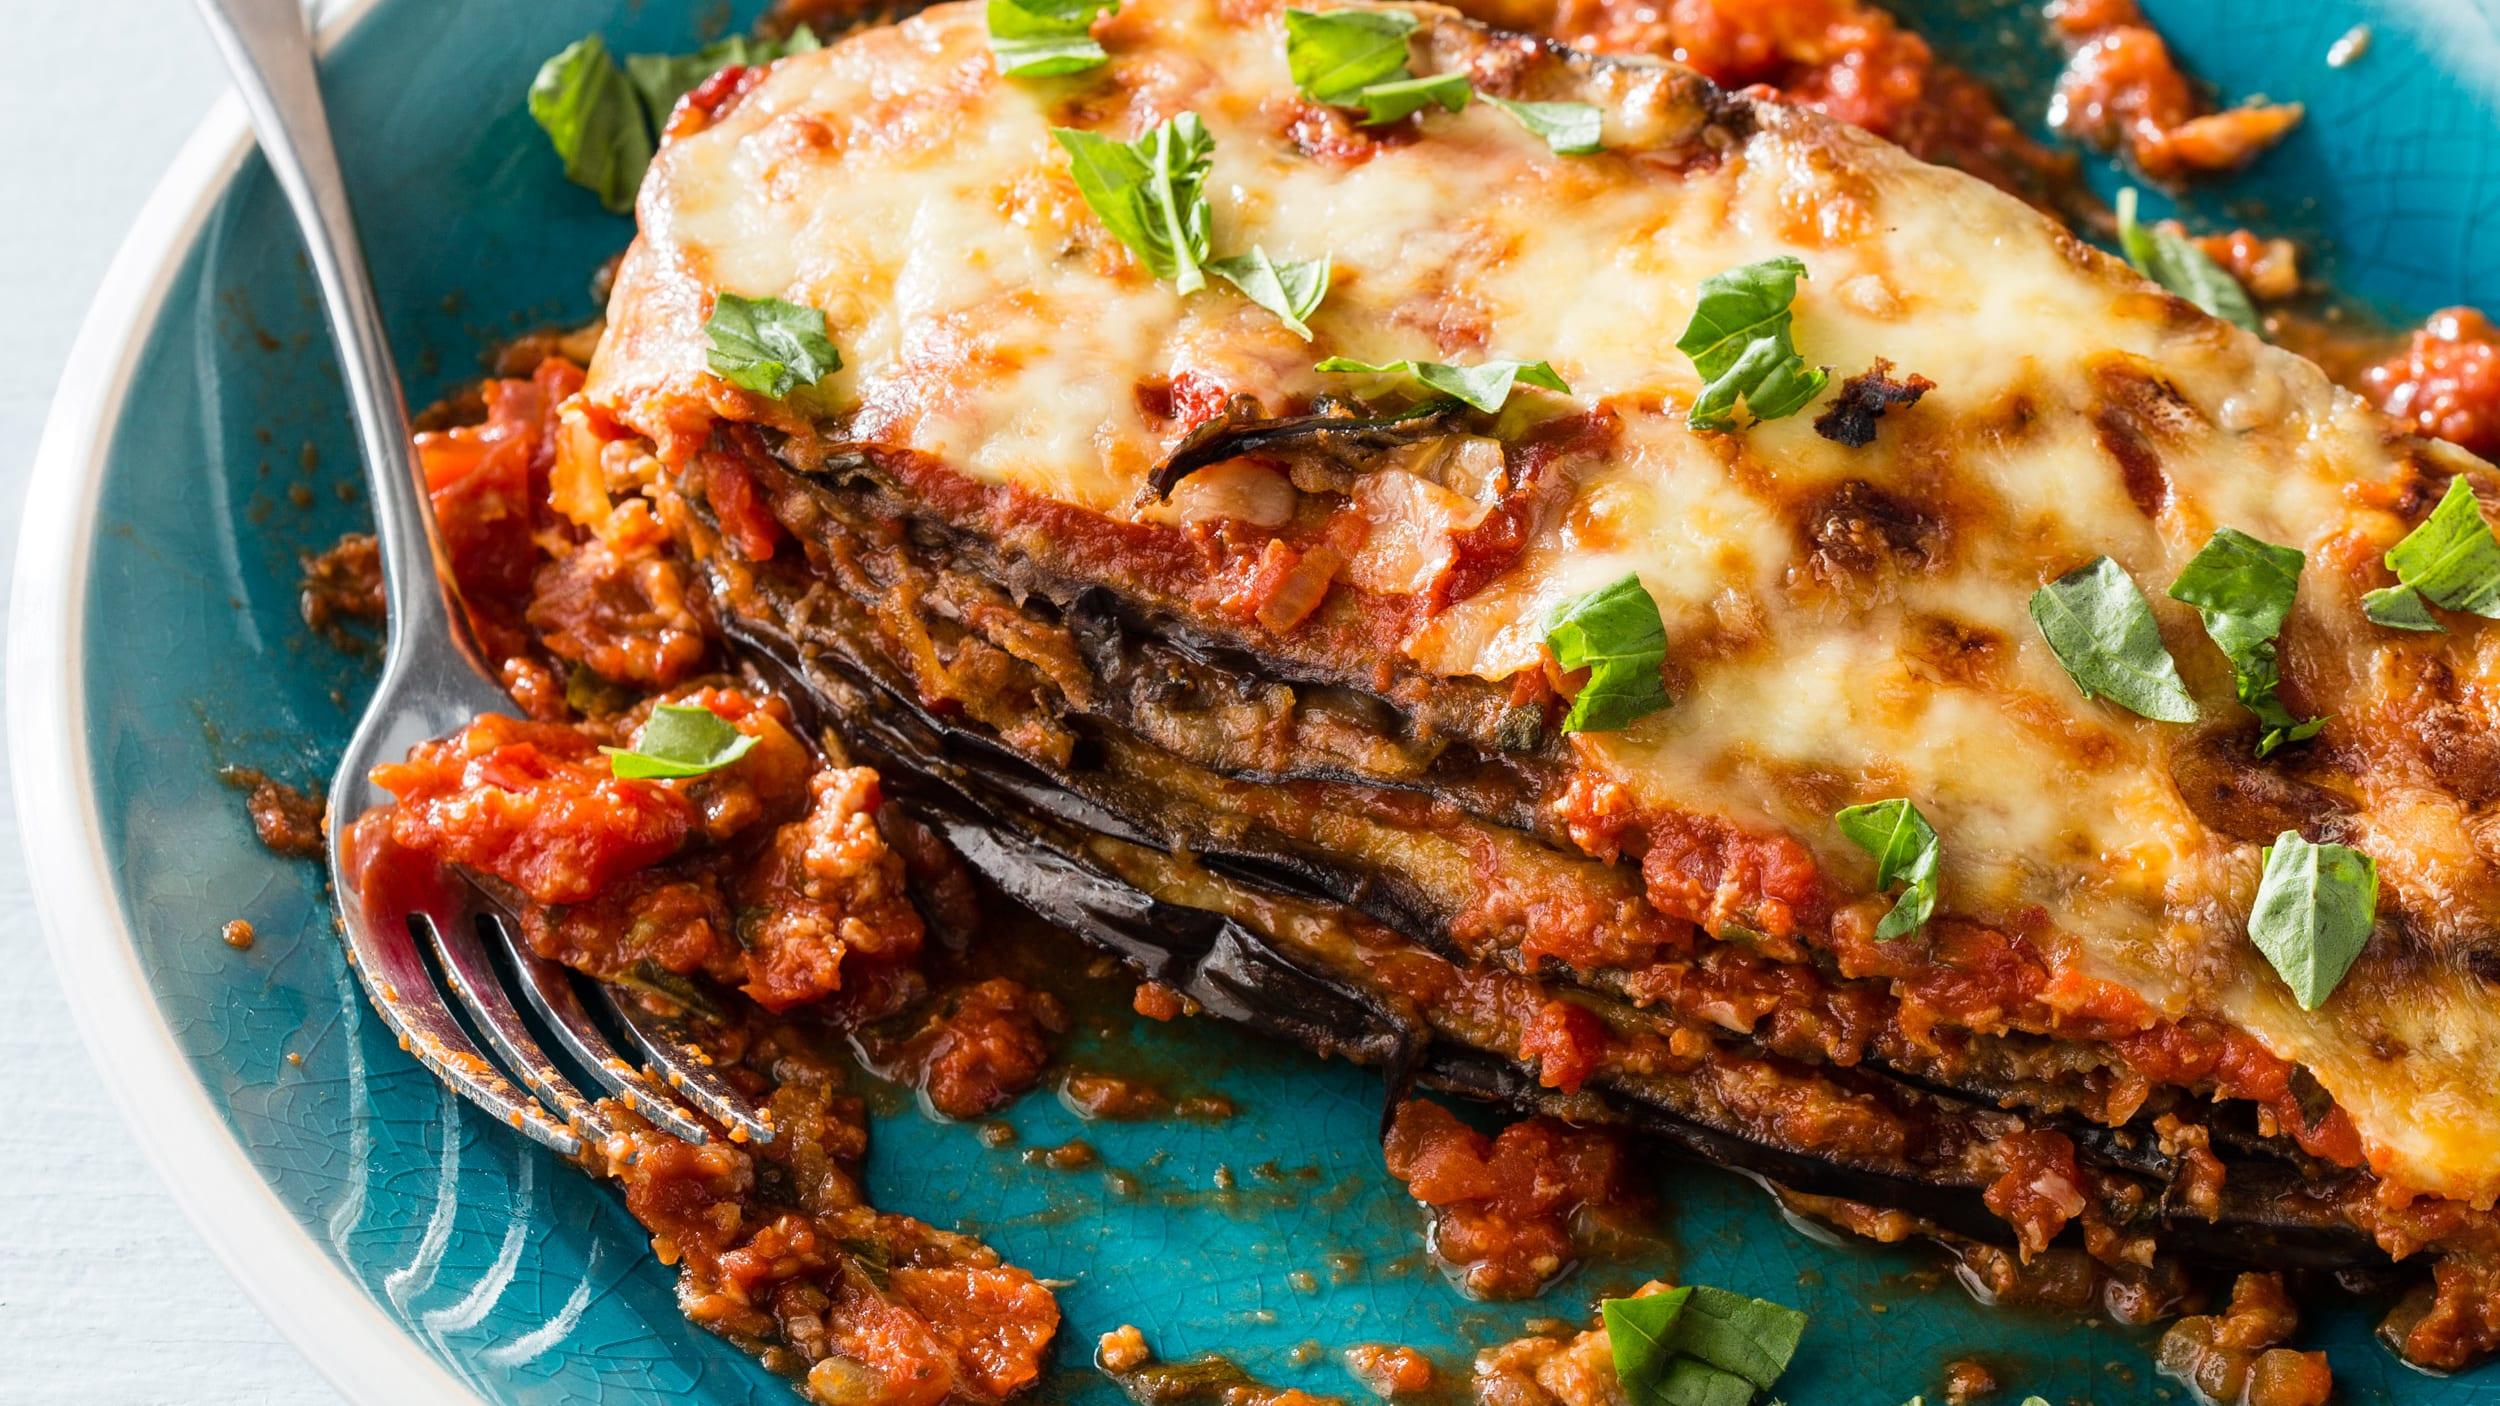 Sfs eggplant pecorino 23 hm6b23